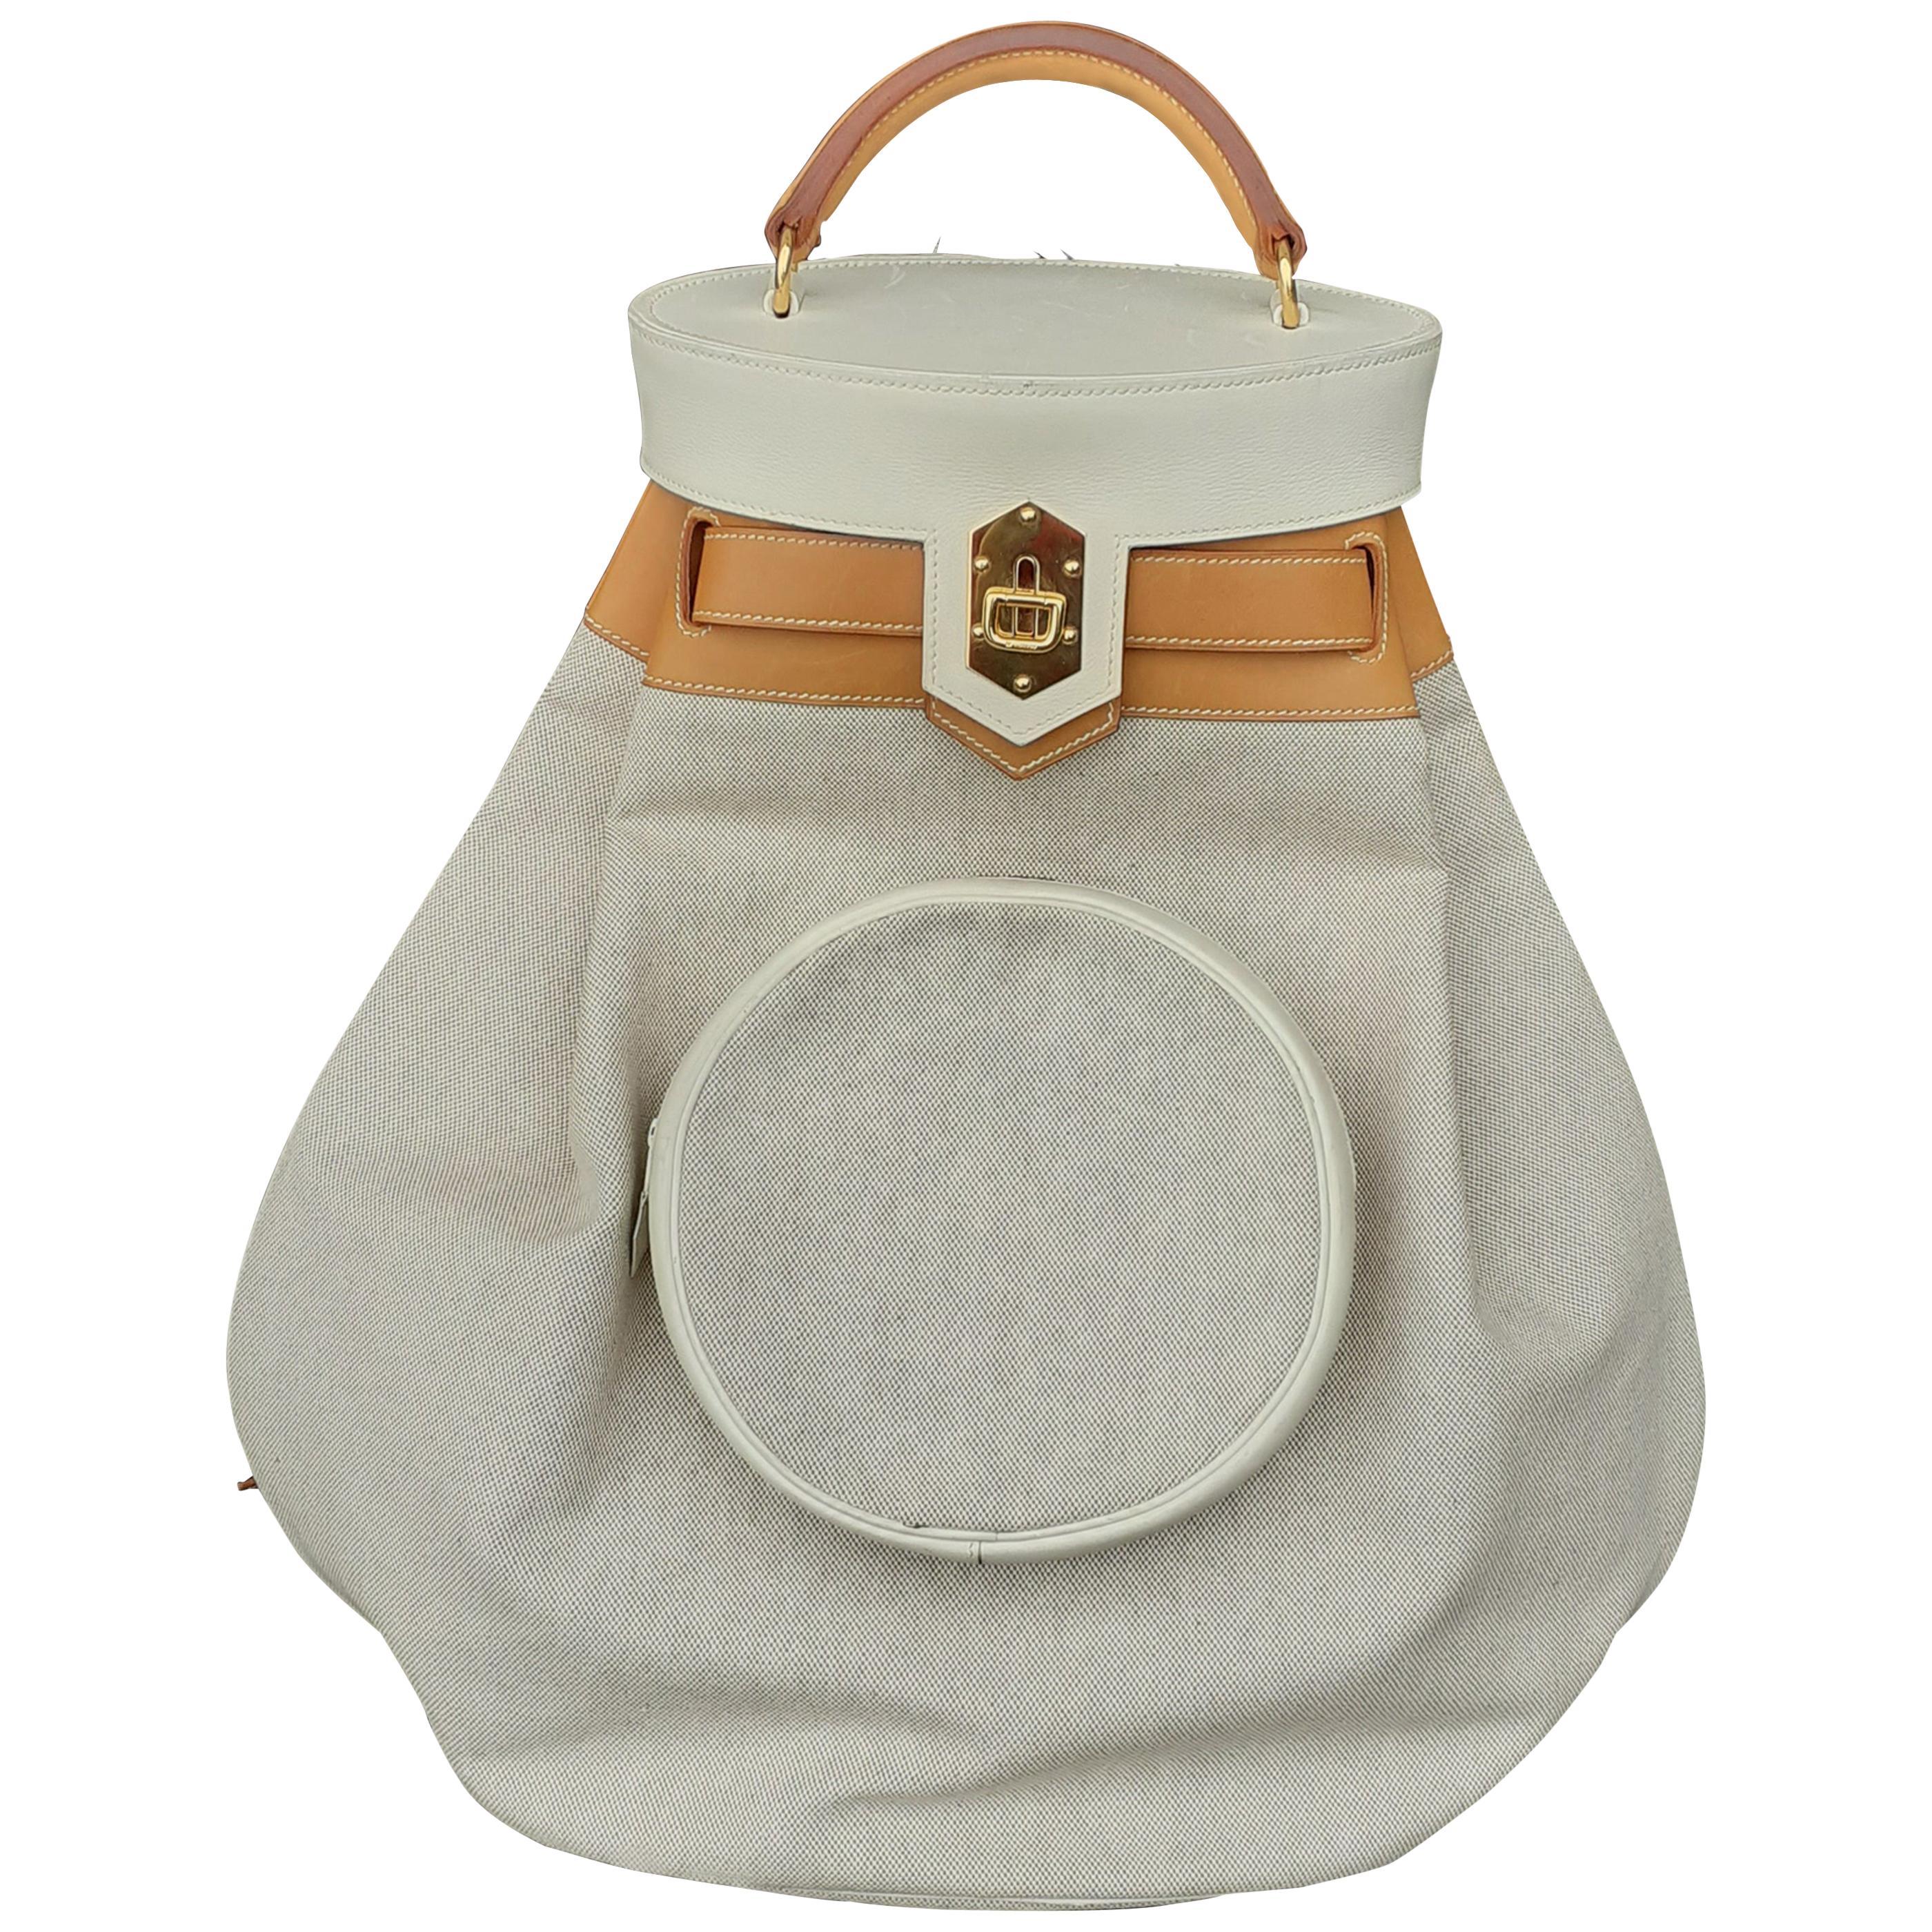 Rare Hermès Vintage Sumac Travel Riding or Picnic Bag Canvas Leather 50 cm